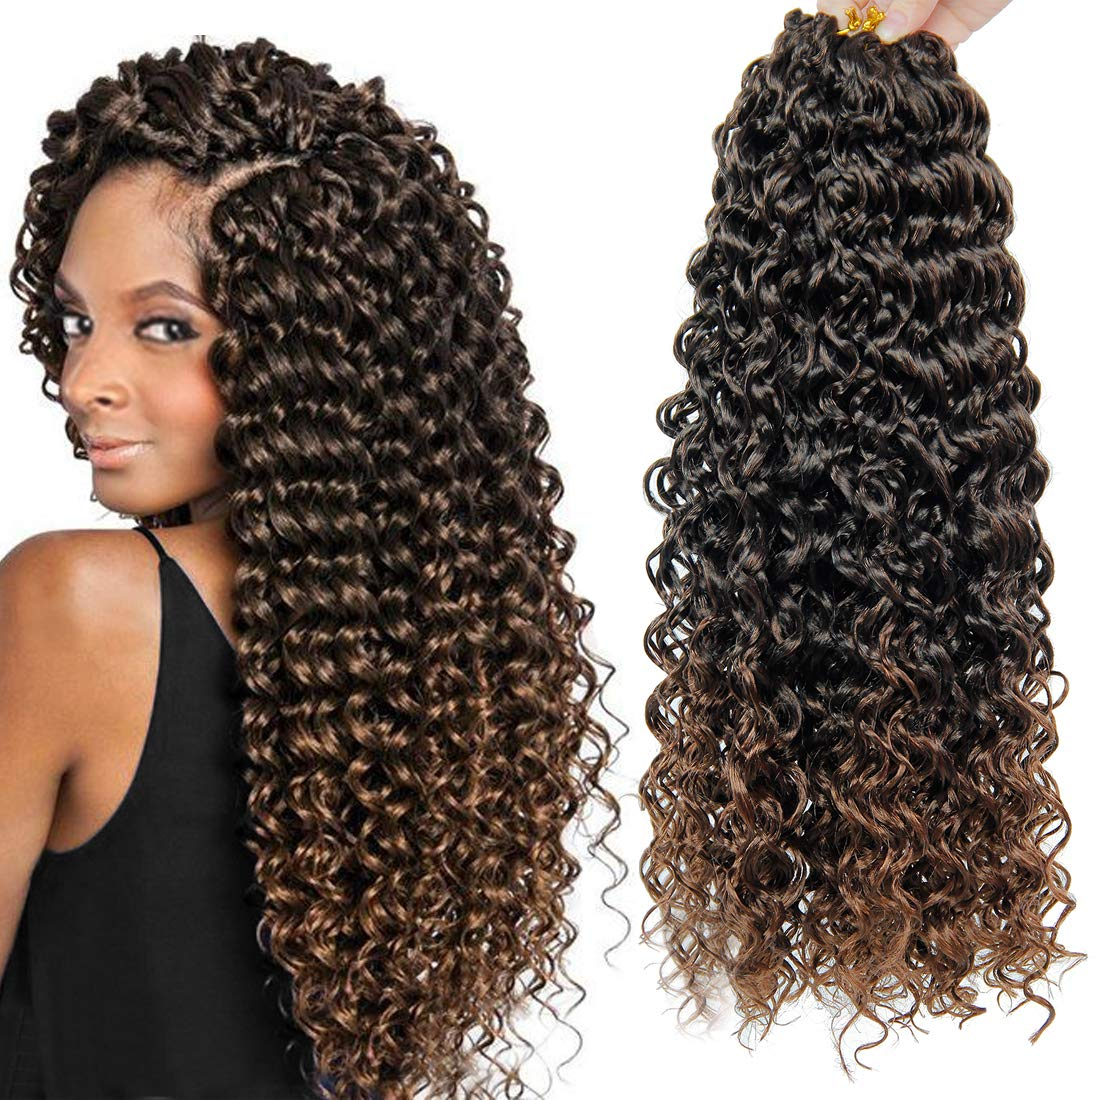 Amazon Com 18inch Bohemian Crochet Hair Braids Ombre Color Deep Wave Braiding Hair Extensions Freetress Synthetic Deep Twist Crochet Hair 5packs 1b 30 Beauty